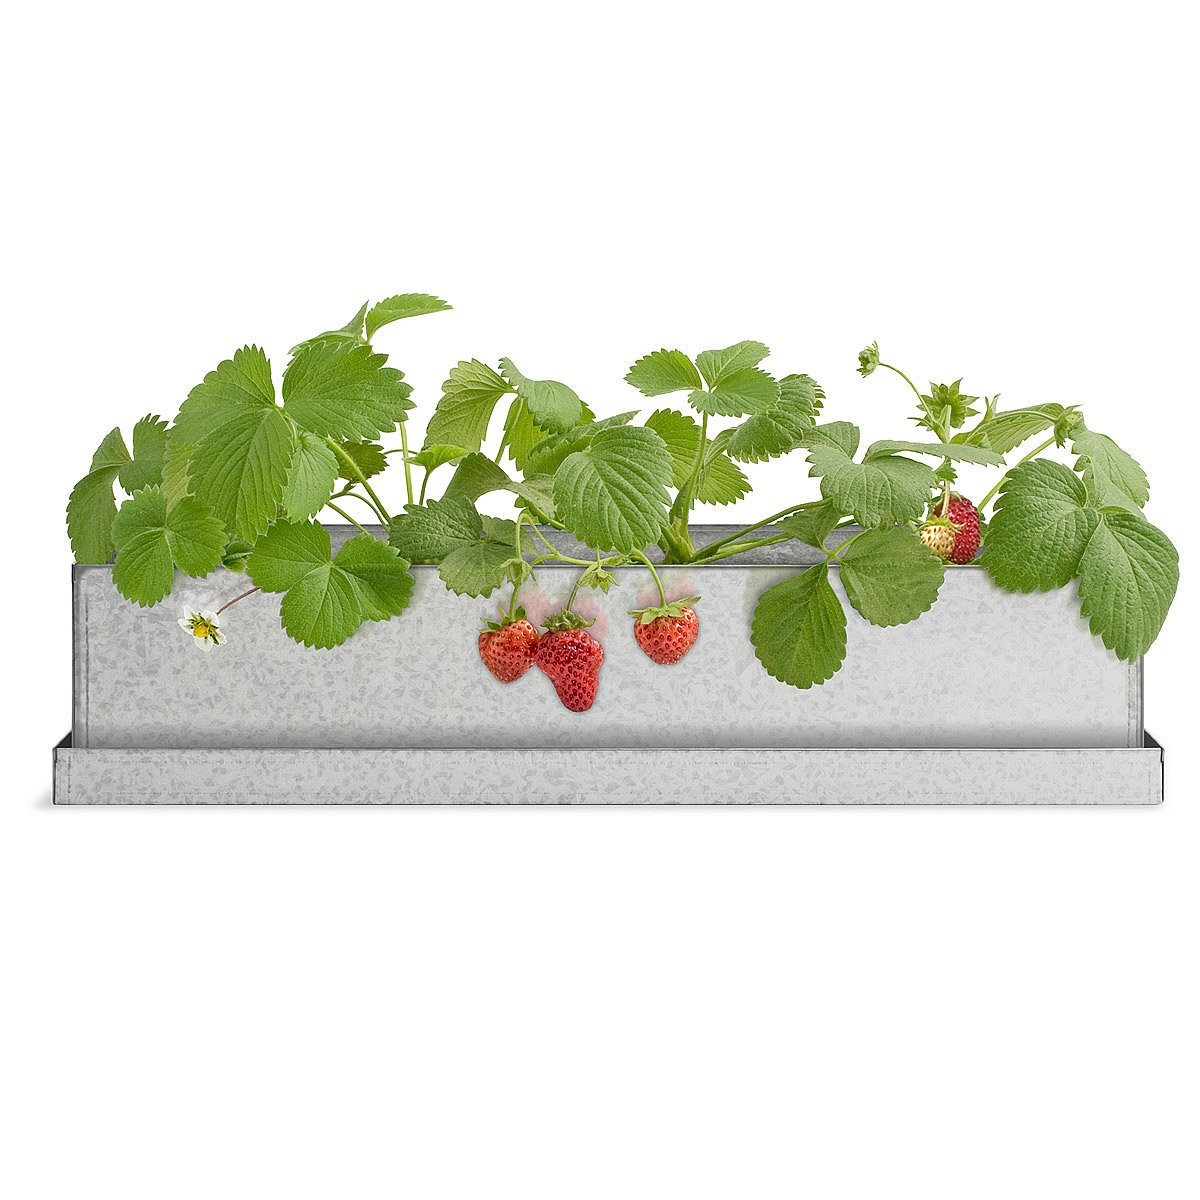 Strawberry Windowsill Growbox grow your own strawberries